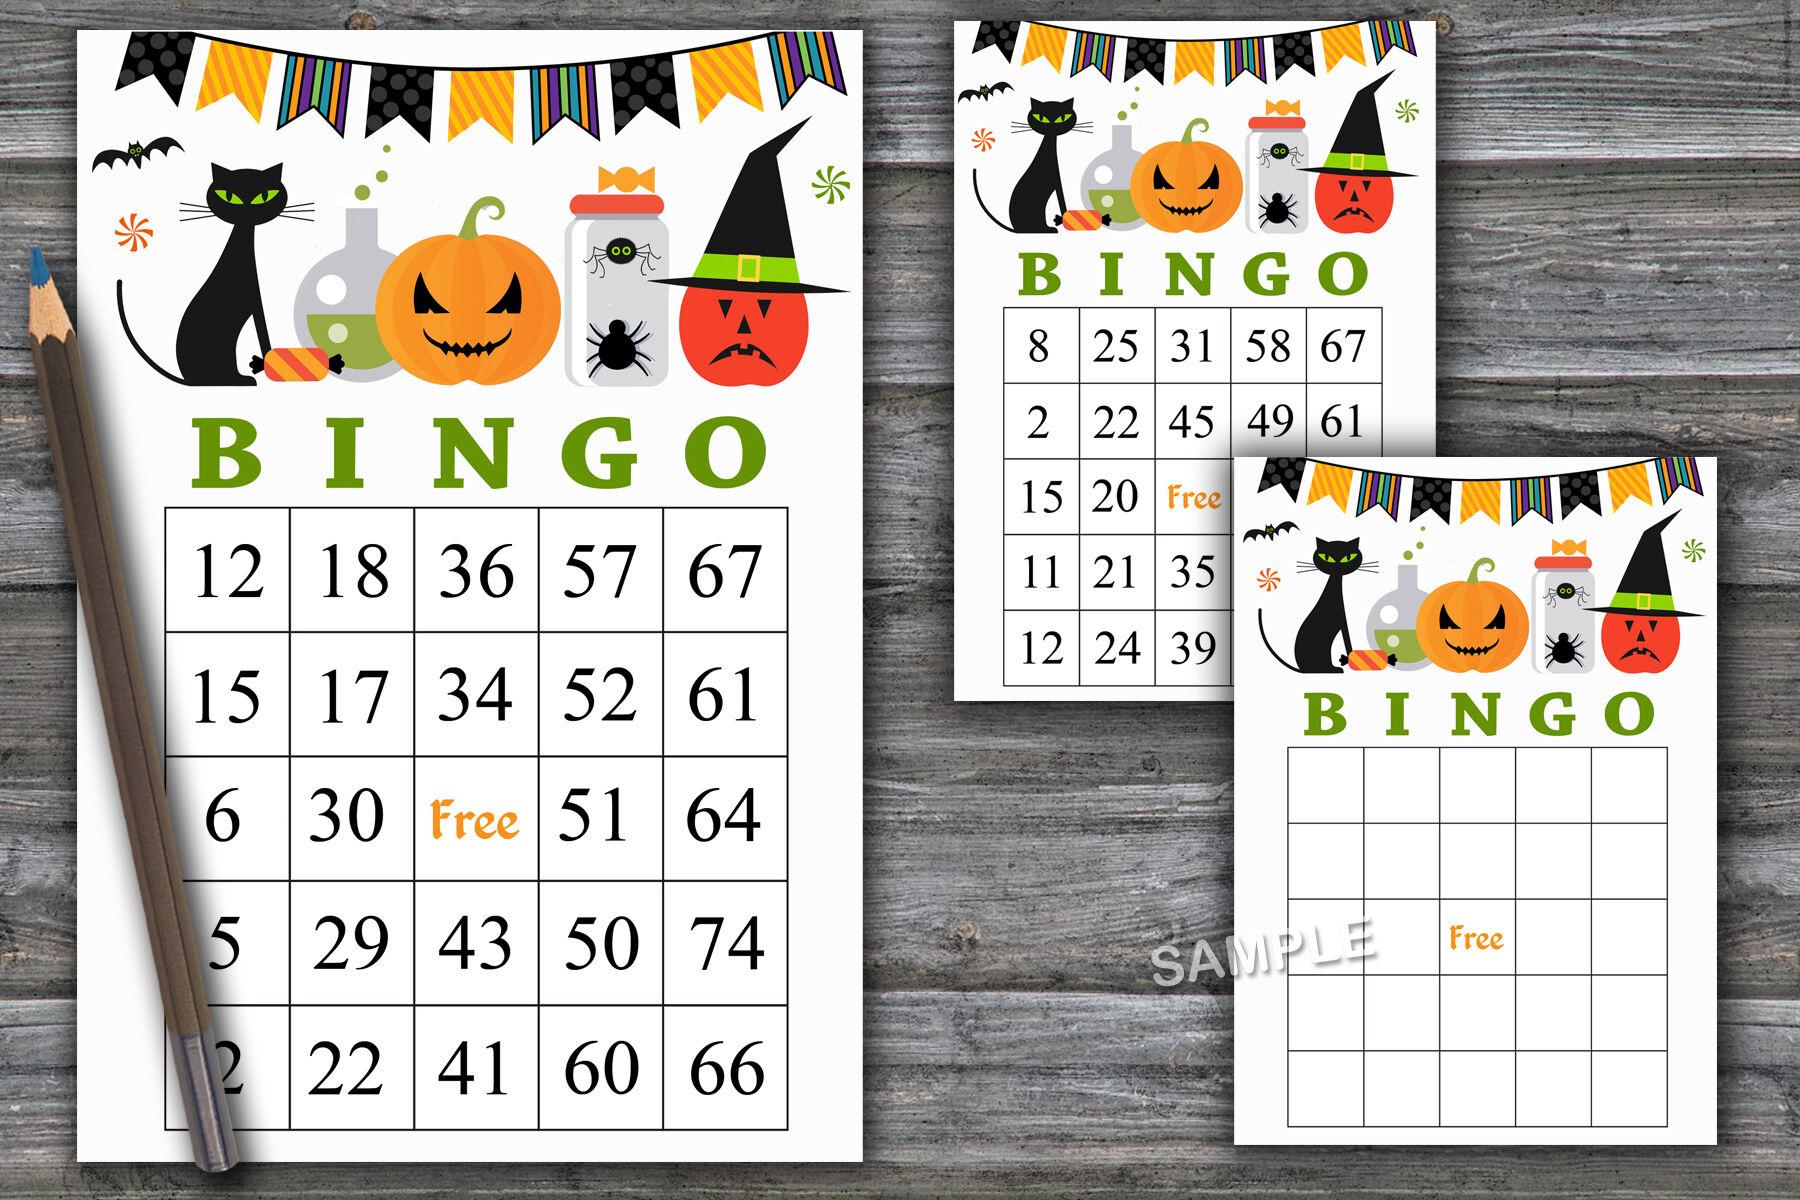 Halloween Bingo Patterns.Halloween Bingo Game Halloween Bingo Cards Halloween Party 45 By Sweetdesign Thehungryjpeg Com